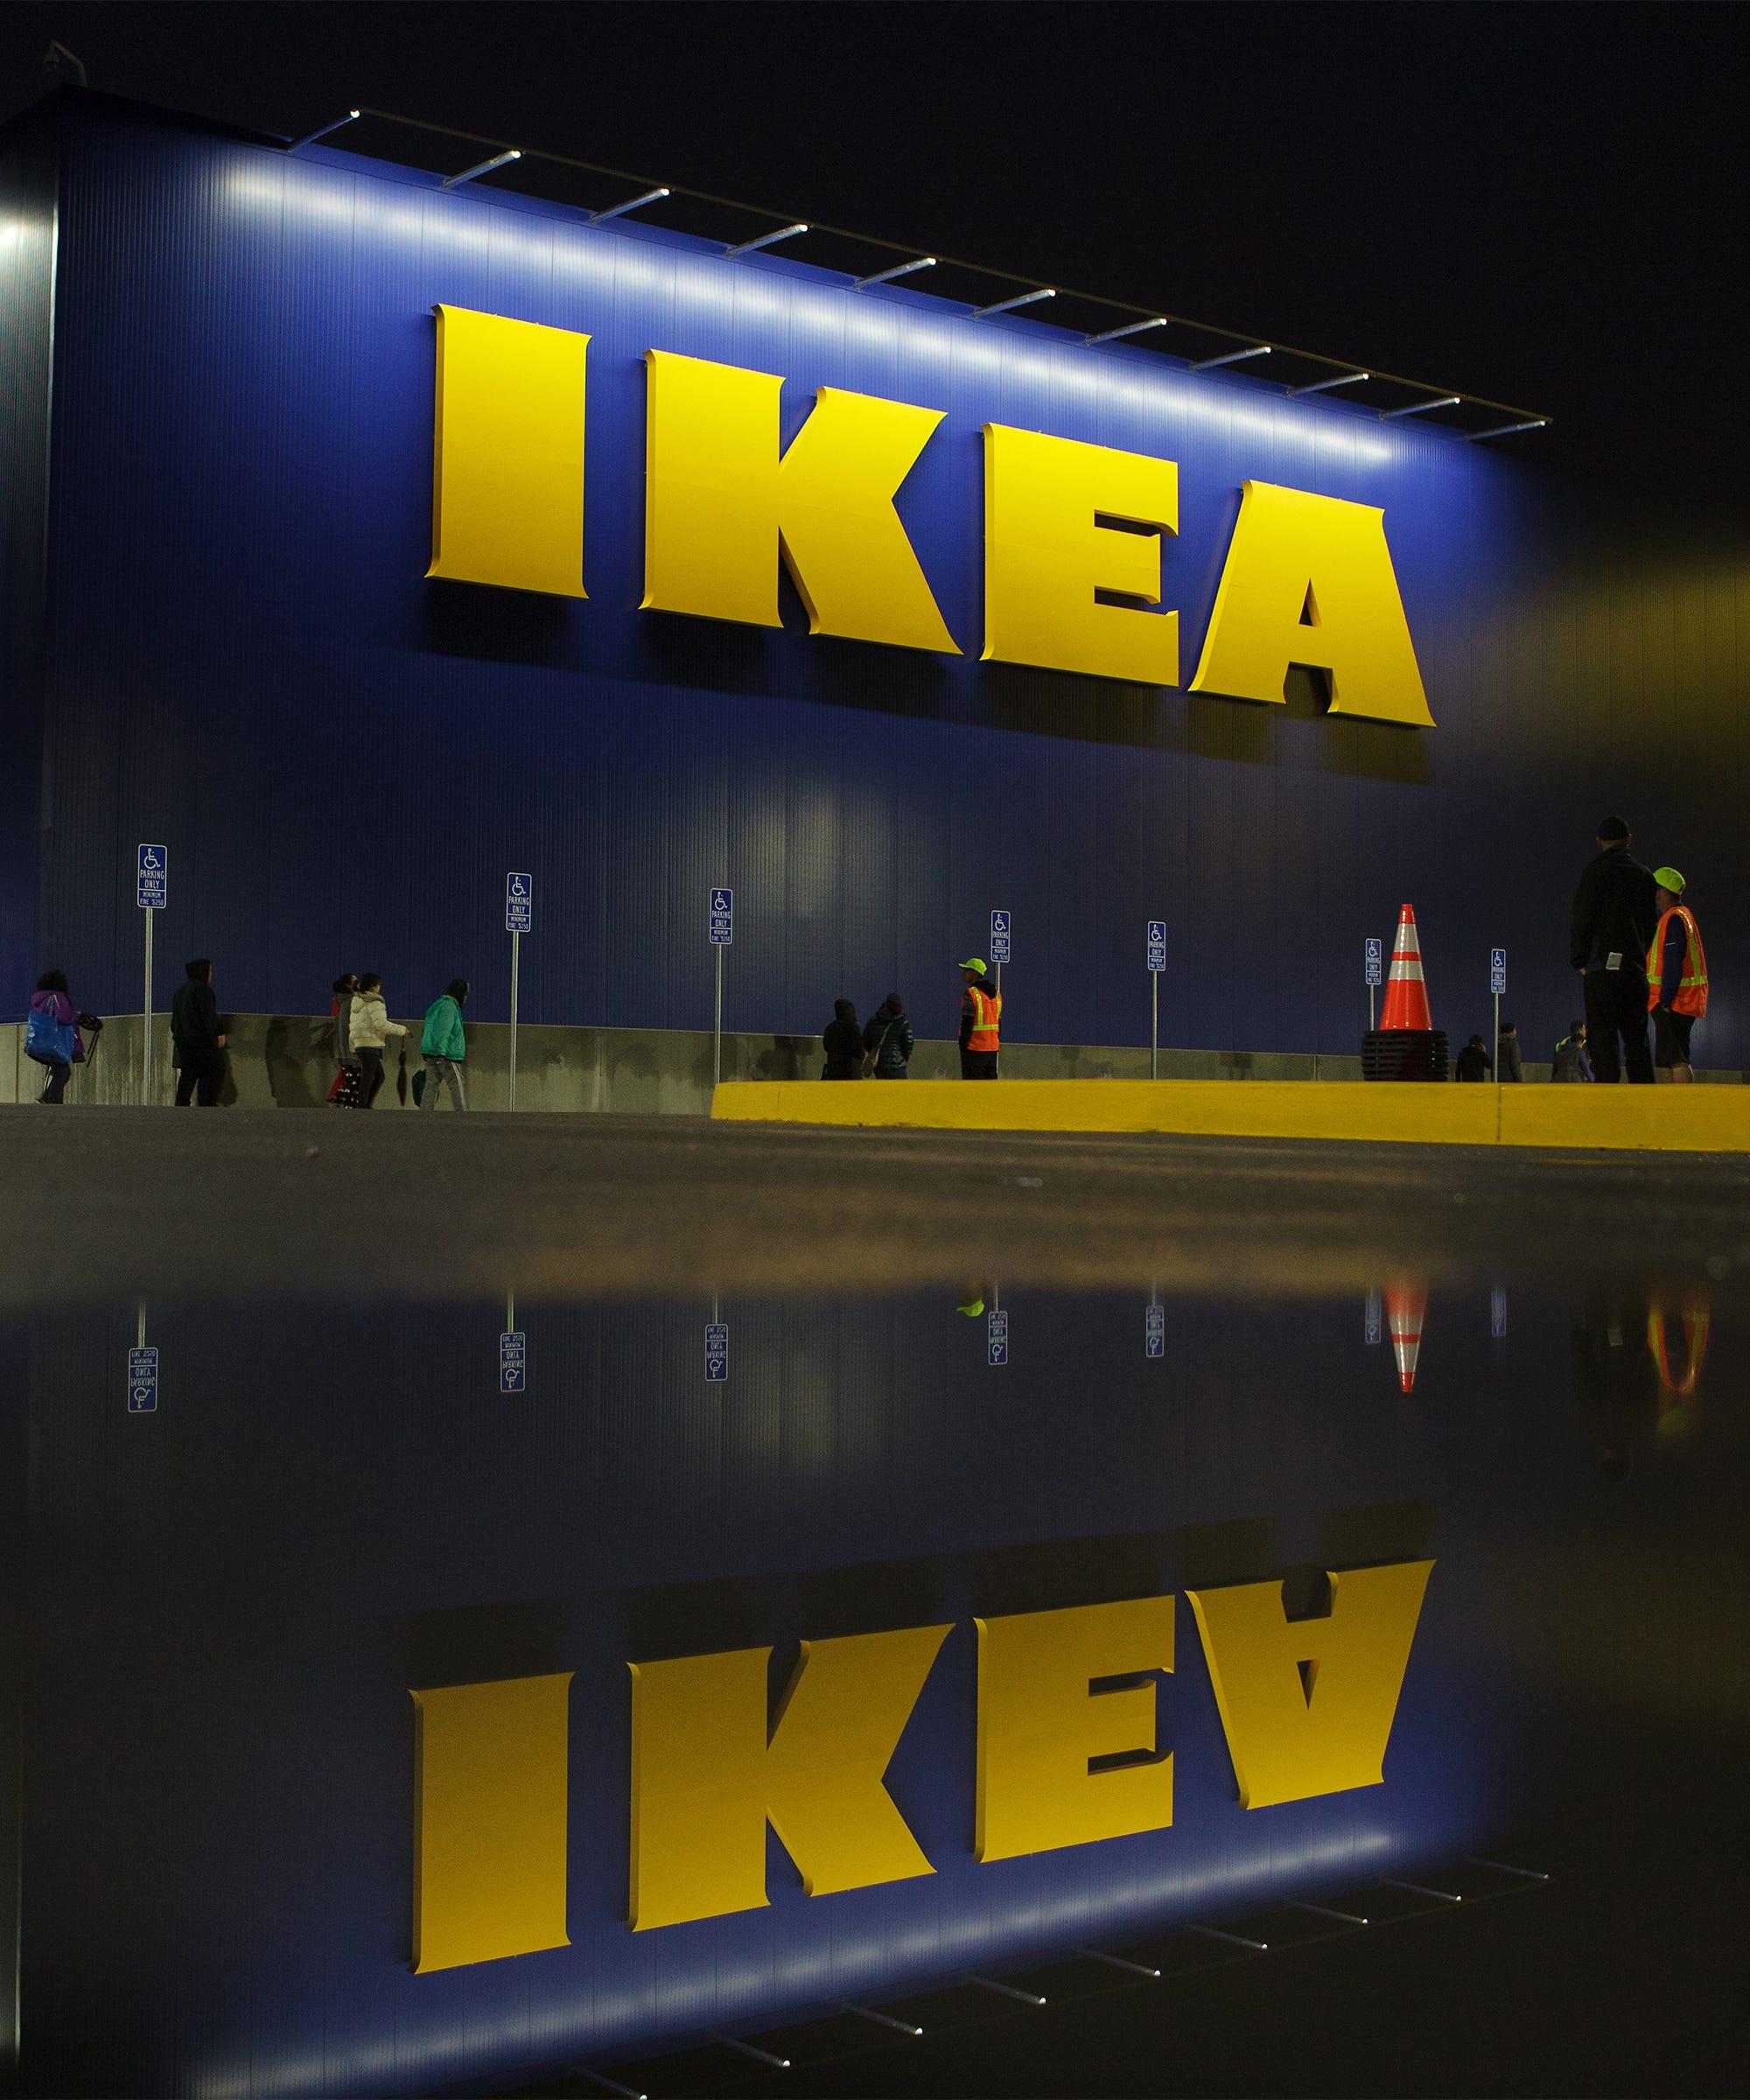 Ikea Black Friday 2018 Best Deals On Furniture Decor